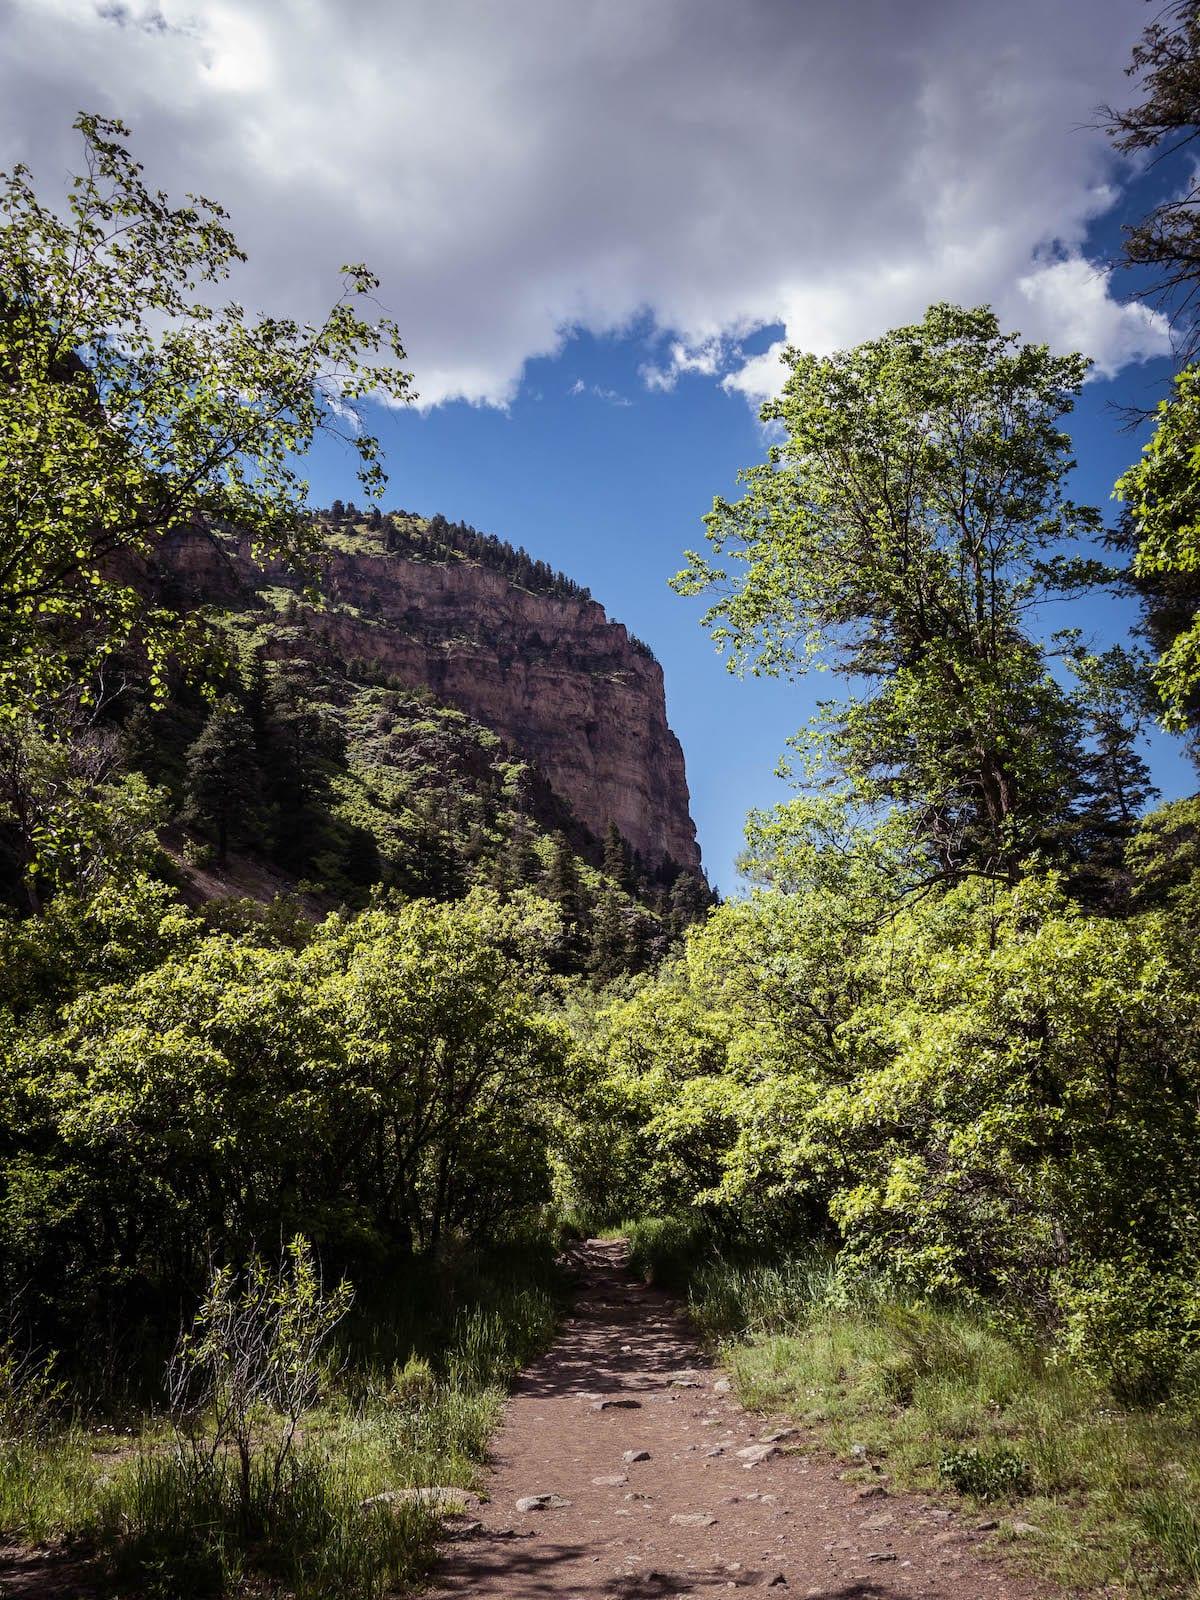 Grizzly Creek Trail Glenwood Canyon Colorado